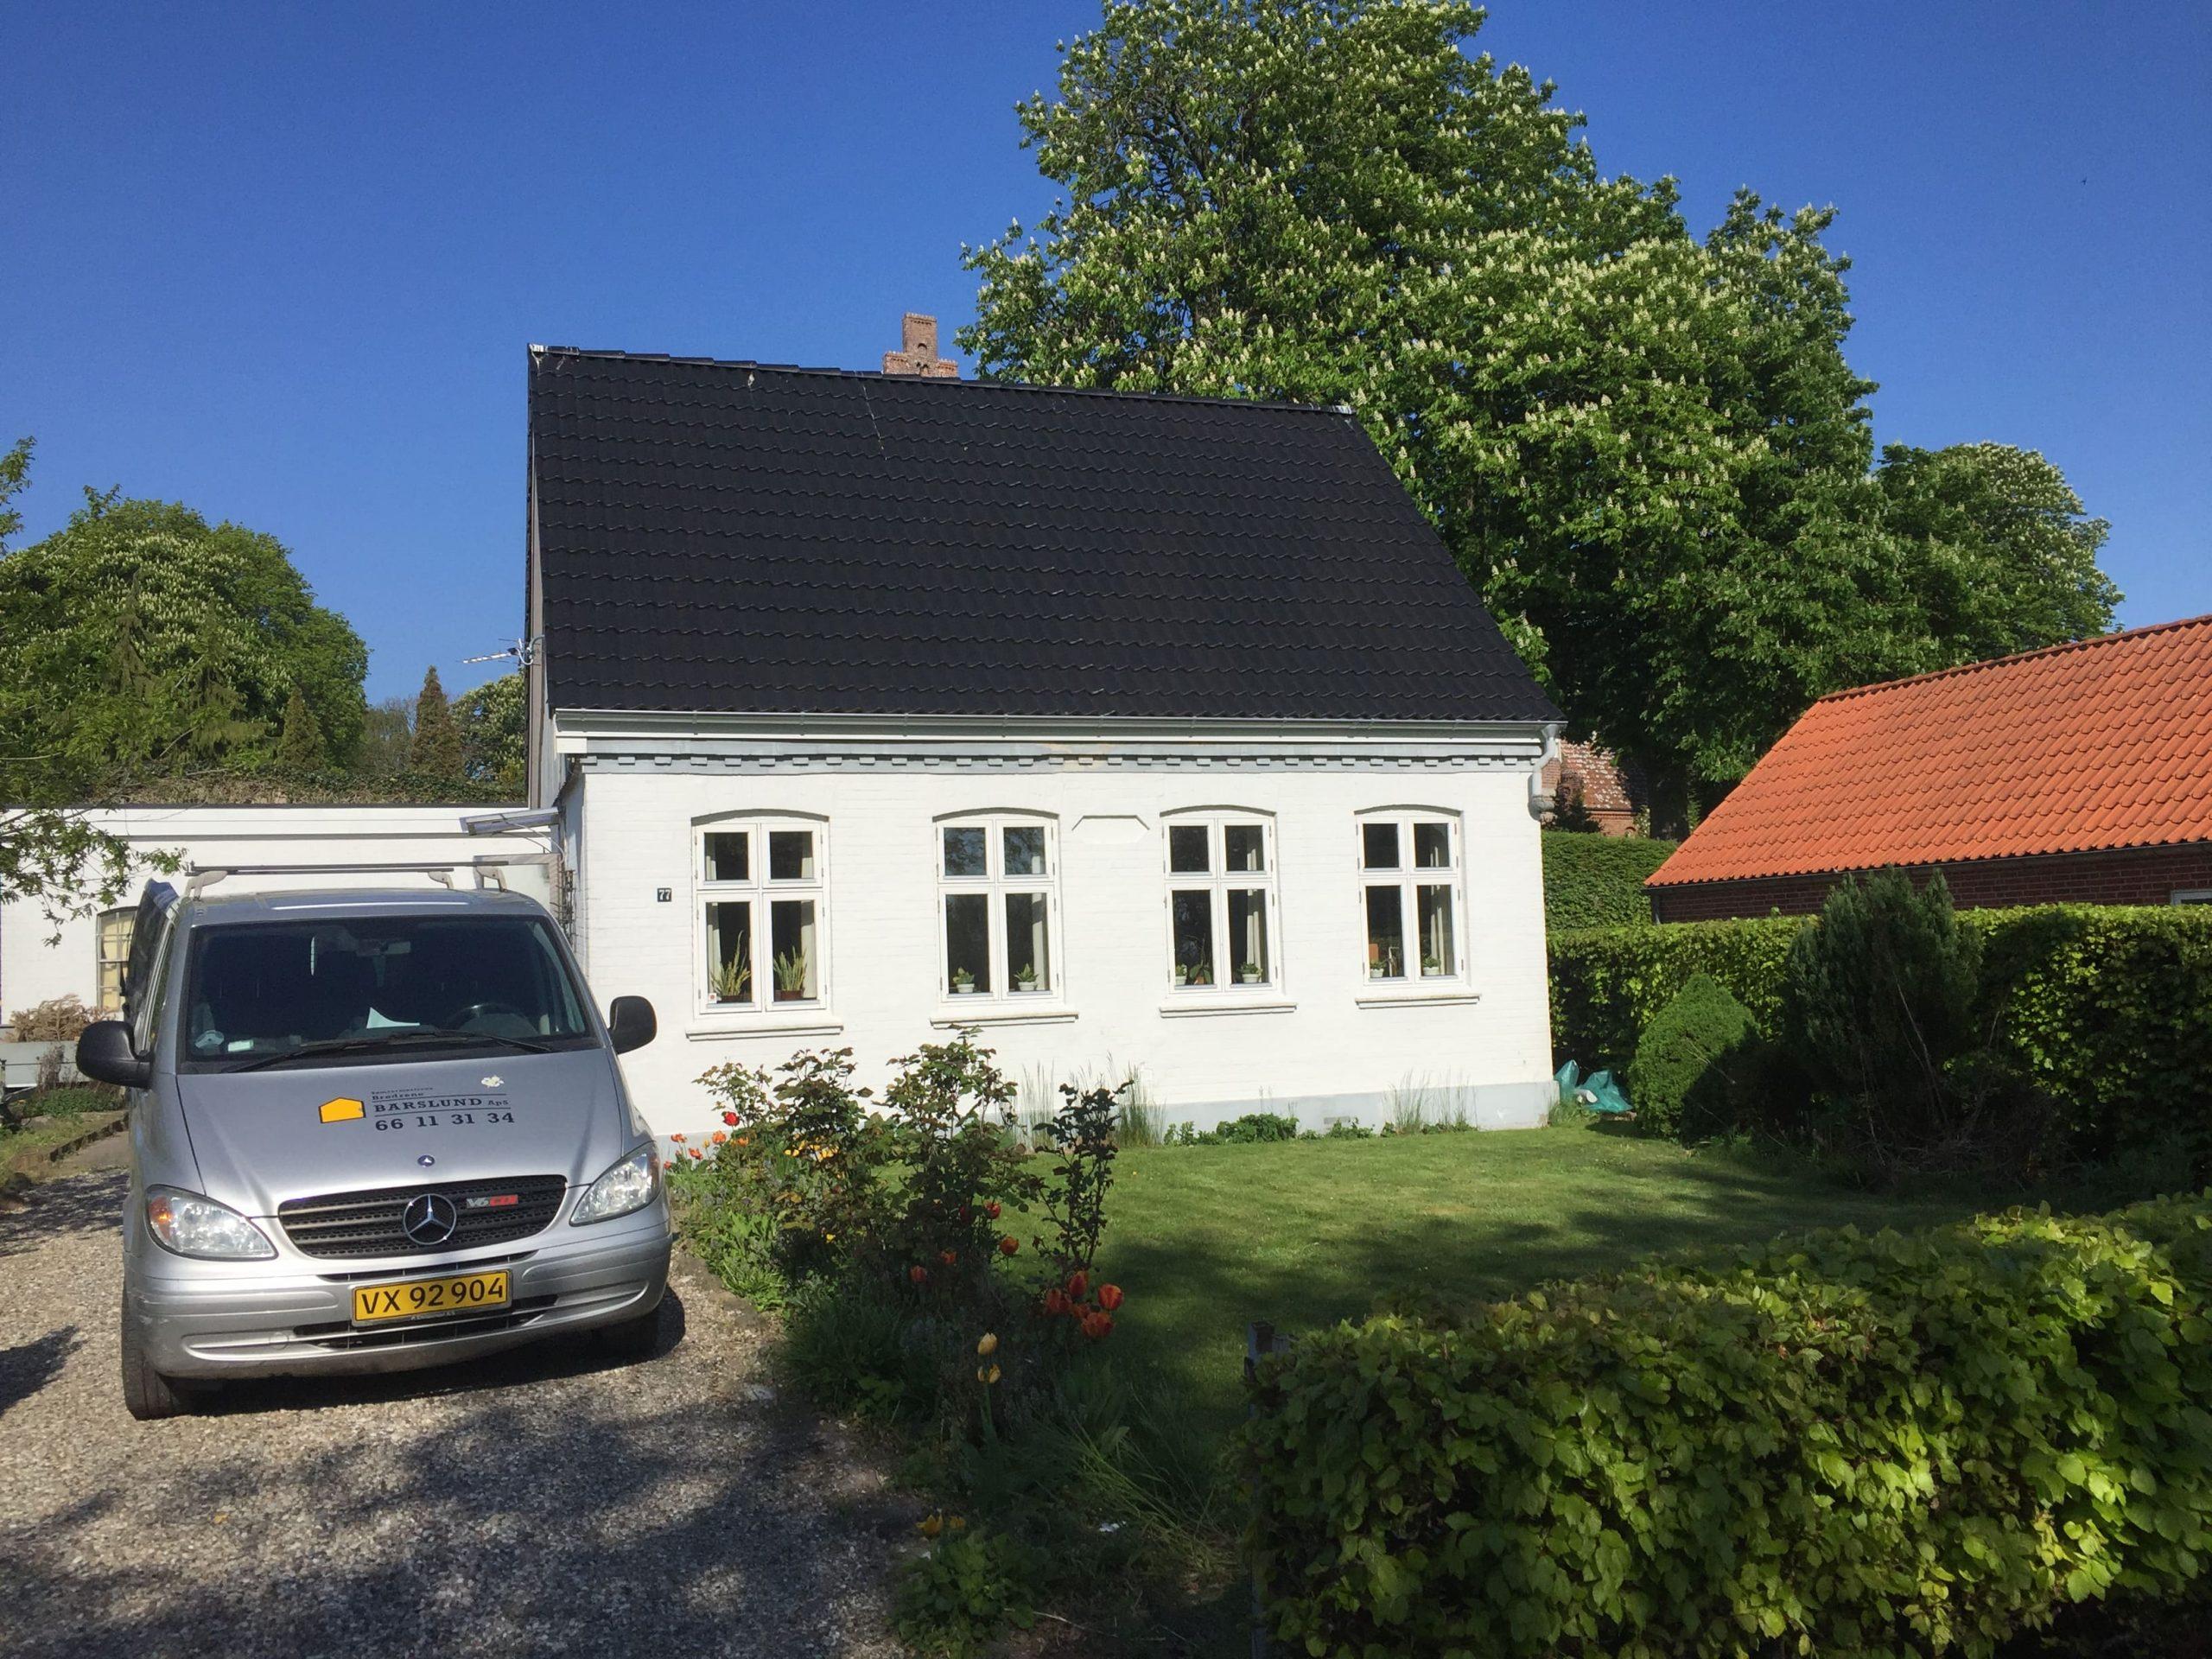 Brdr Barslund Odense ApS